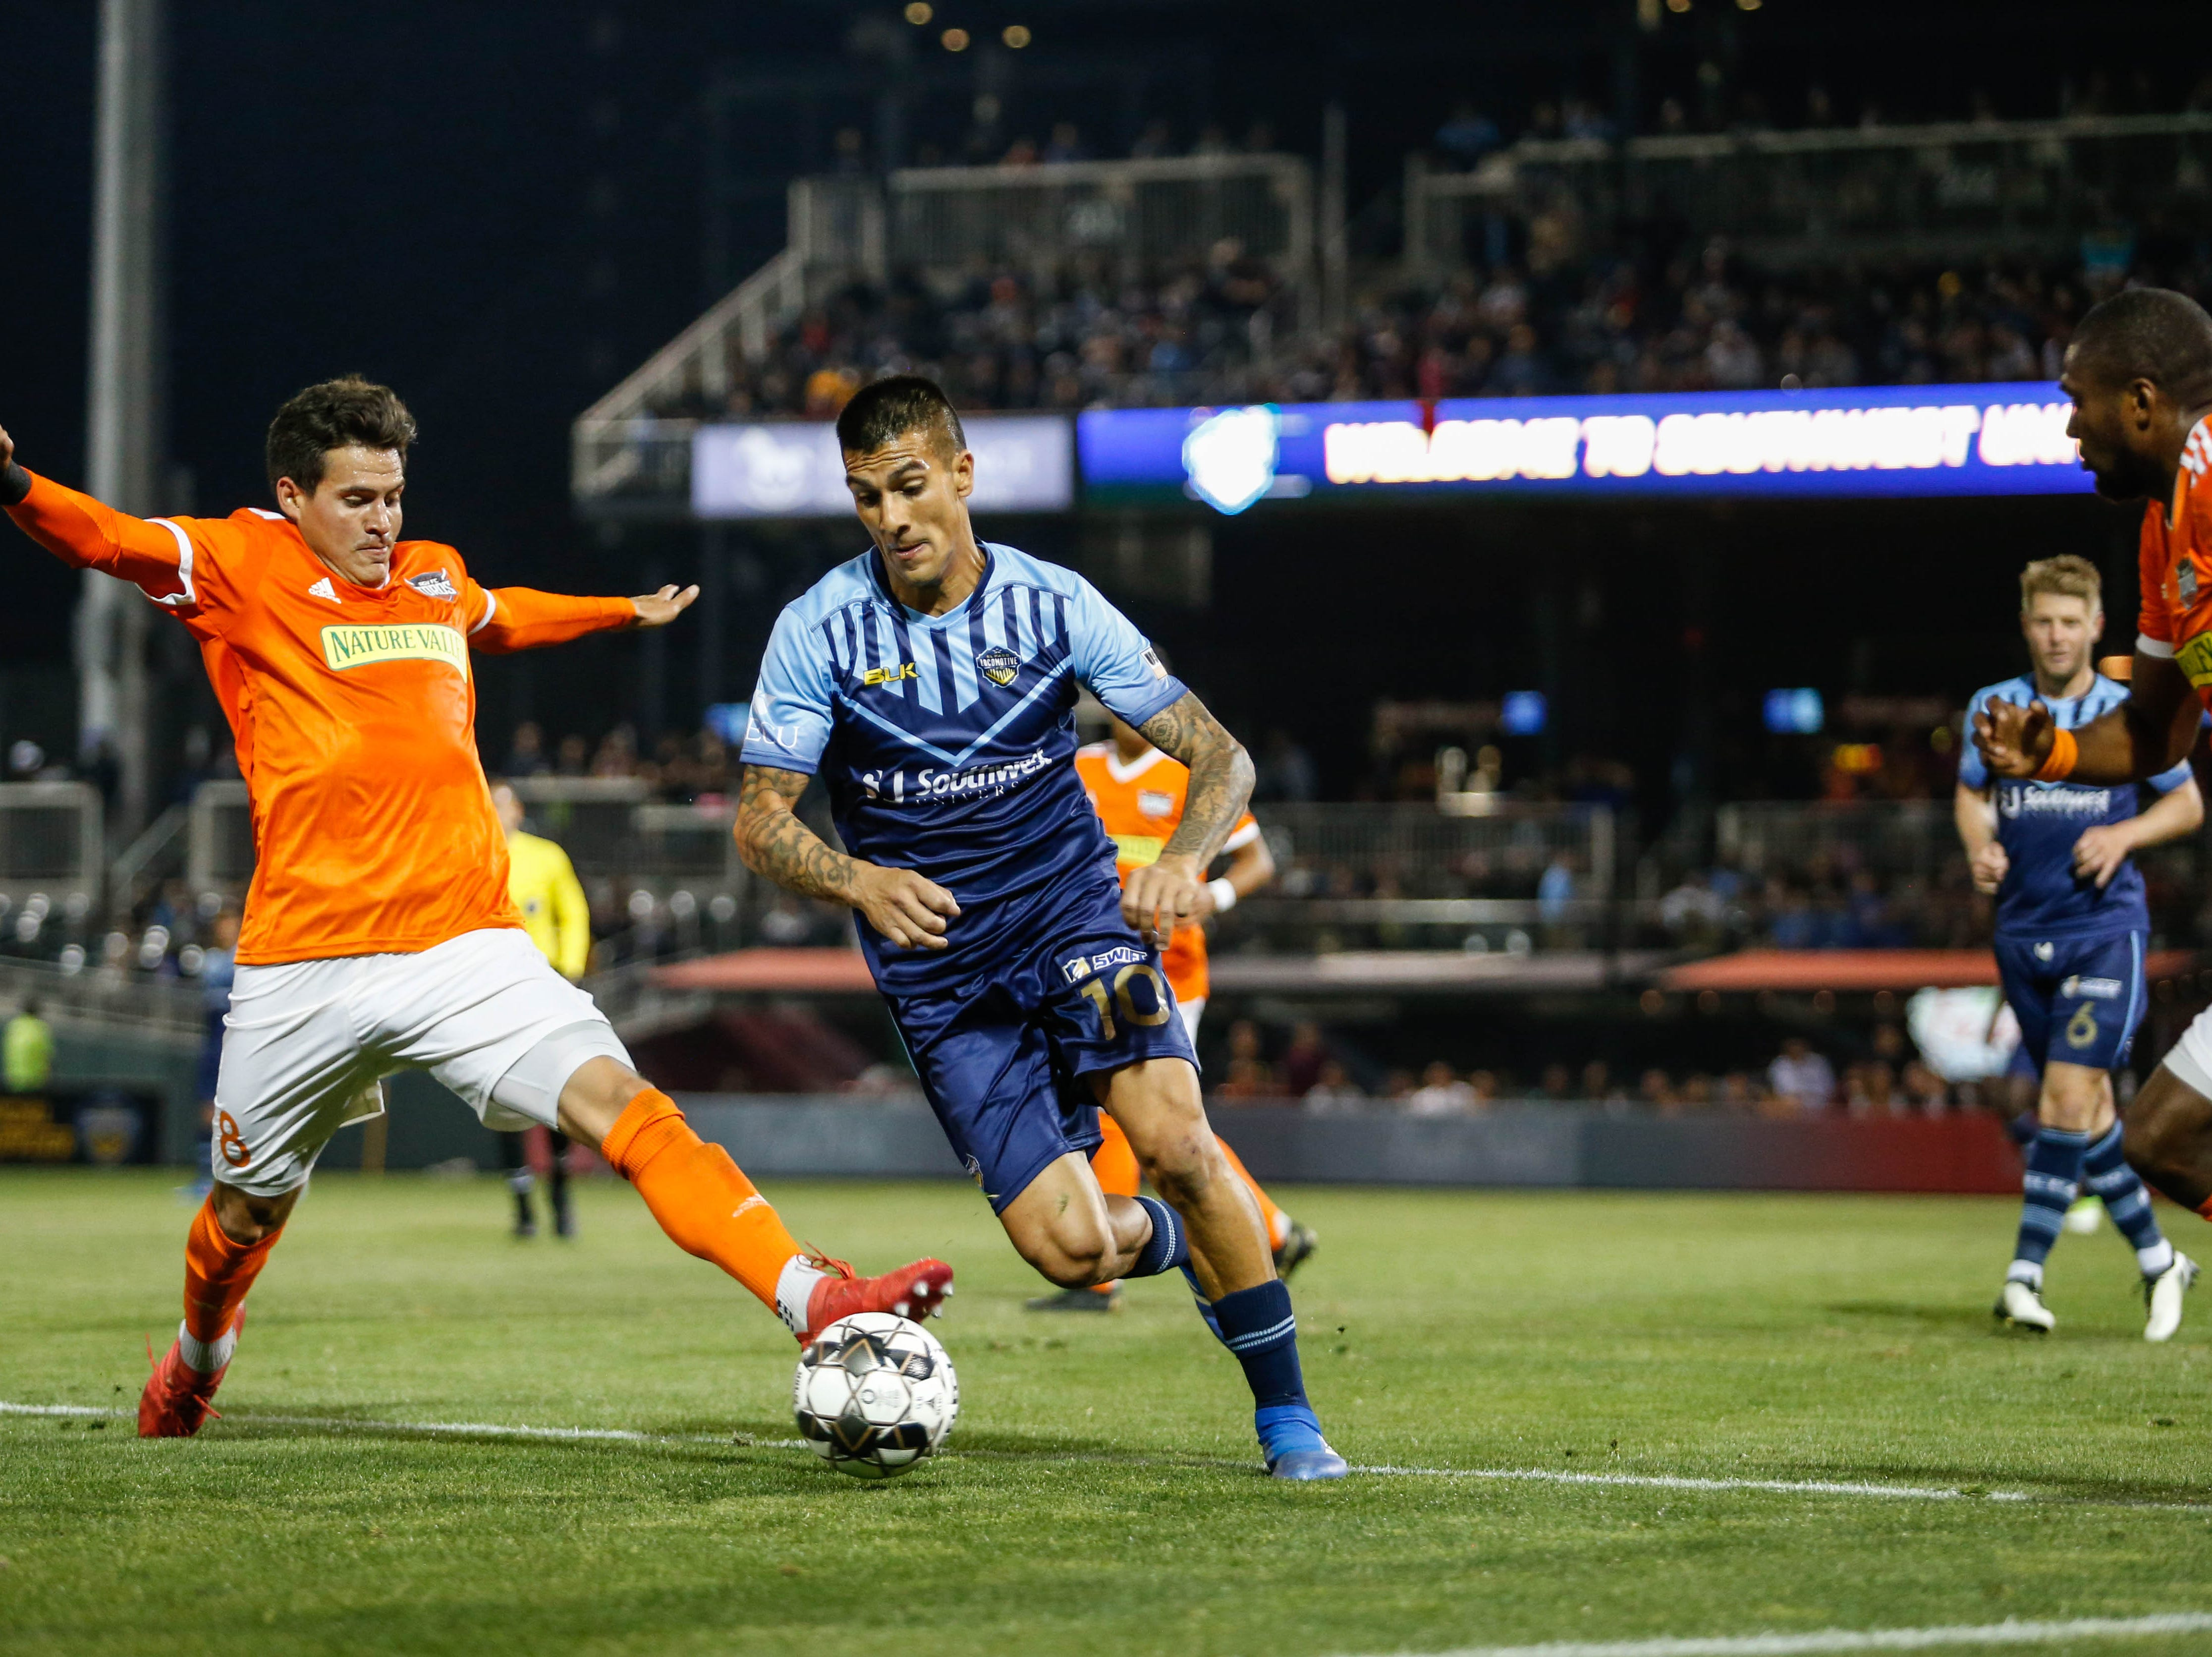 El Paso Locomotive midfielder Sebastián Contreras, center, moves the ball forward.